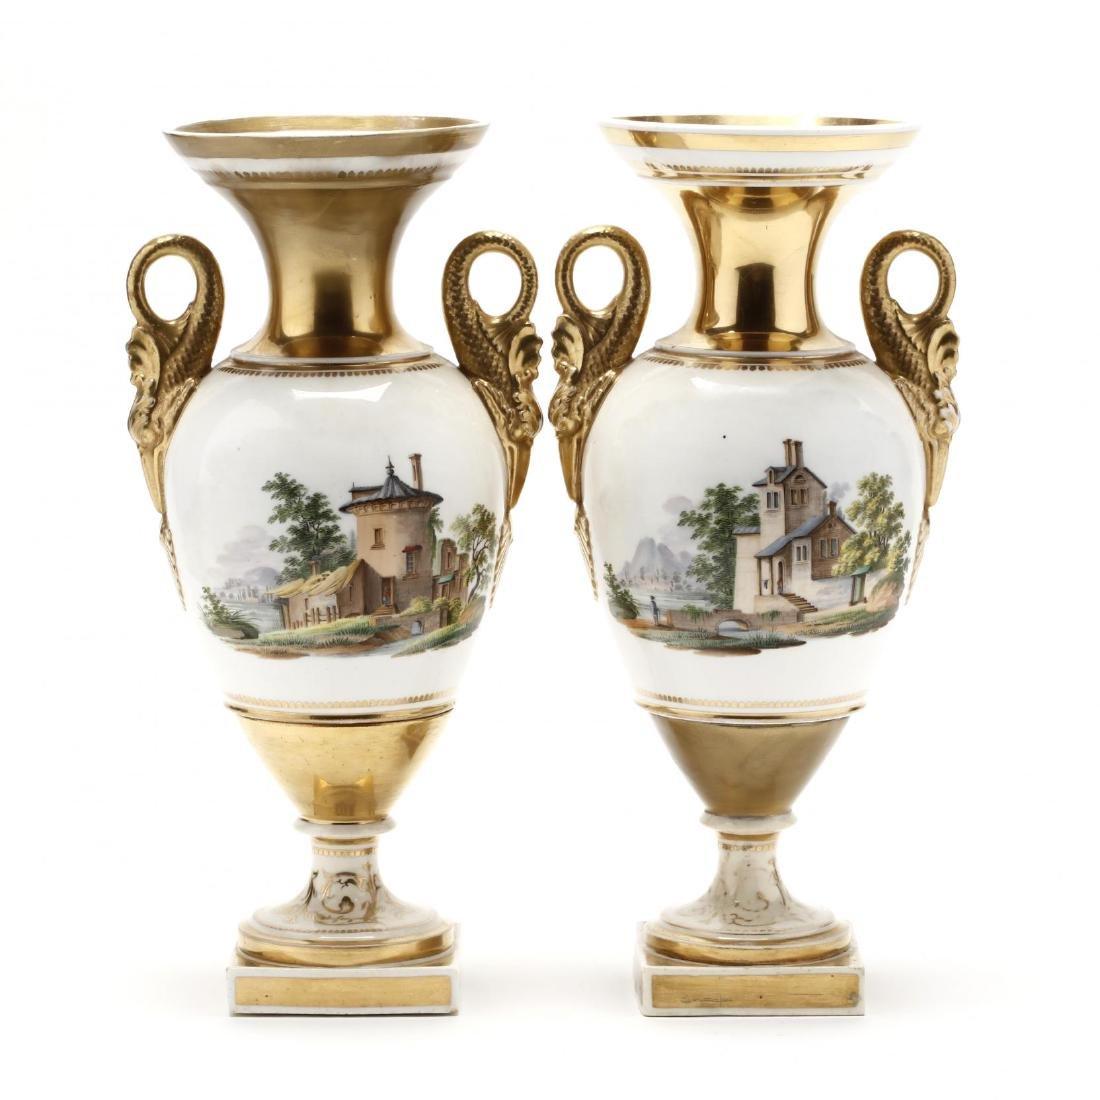 Pair of Early Swansea Gilt Vases